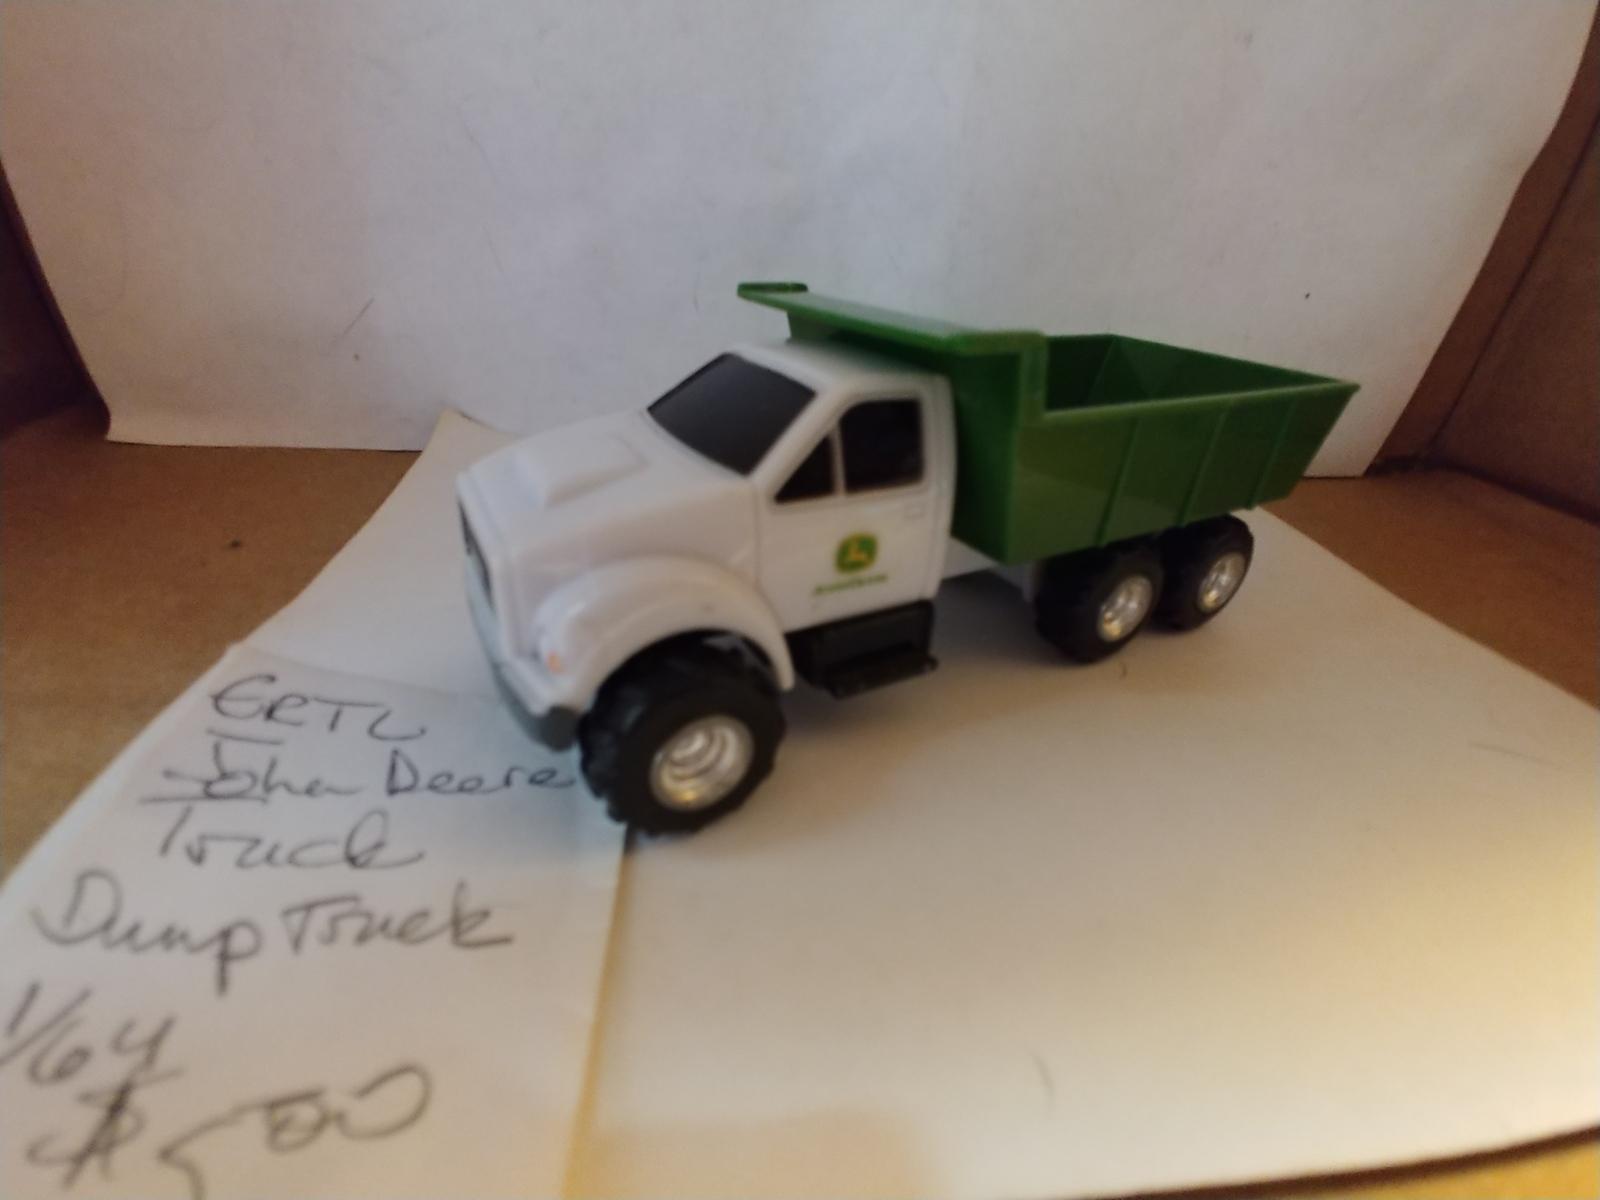 1/64 Dr to John Deere Dump Truck  - $5.00